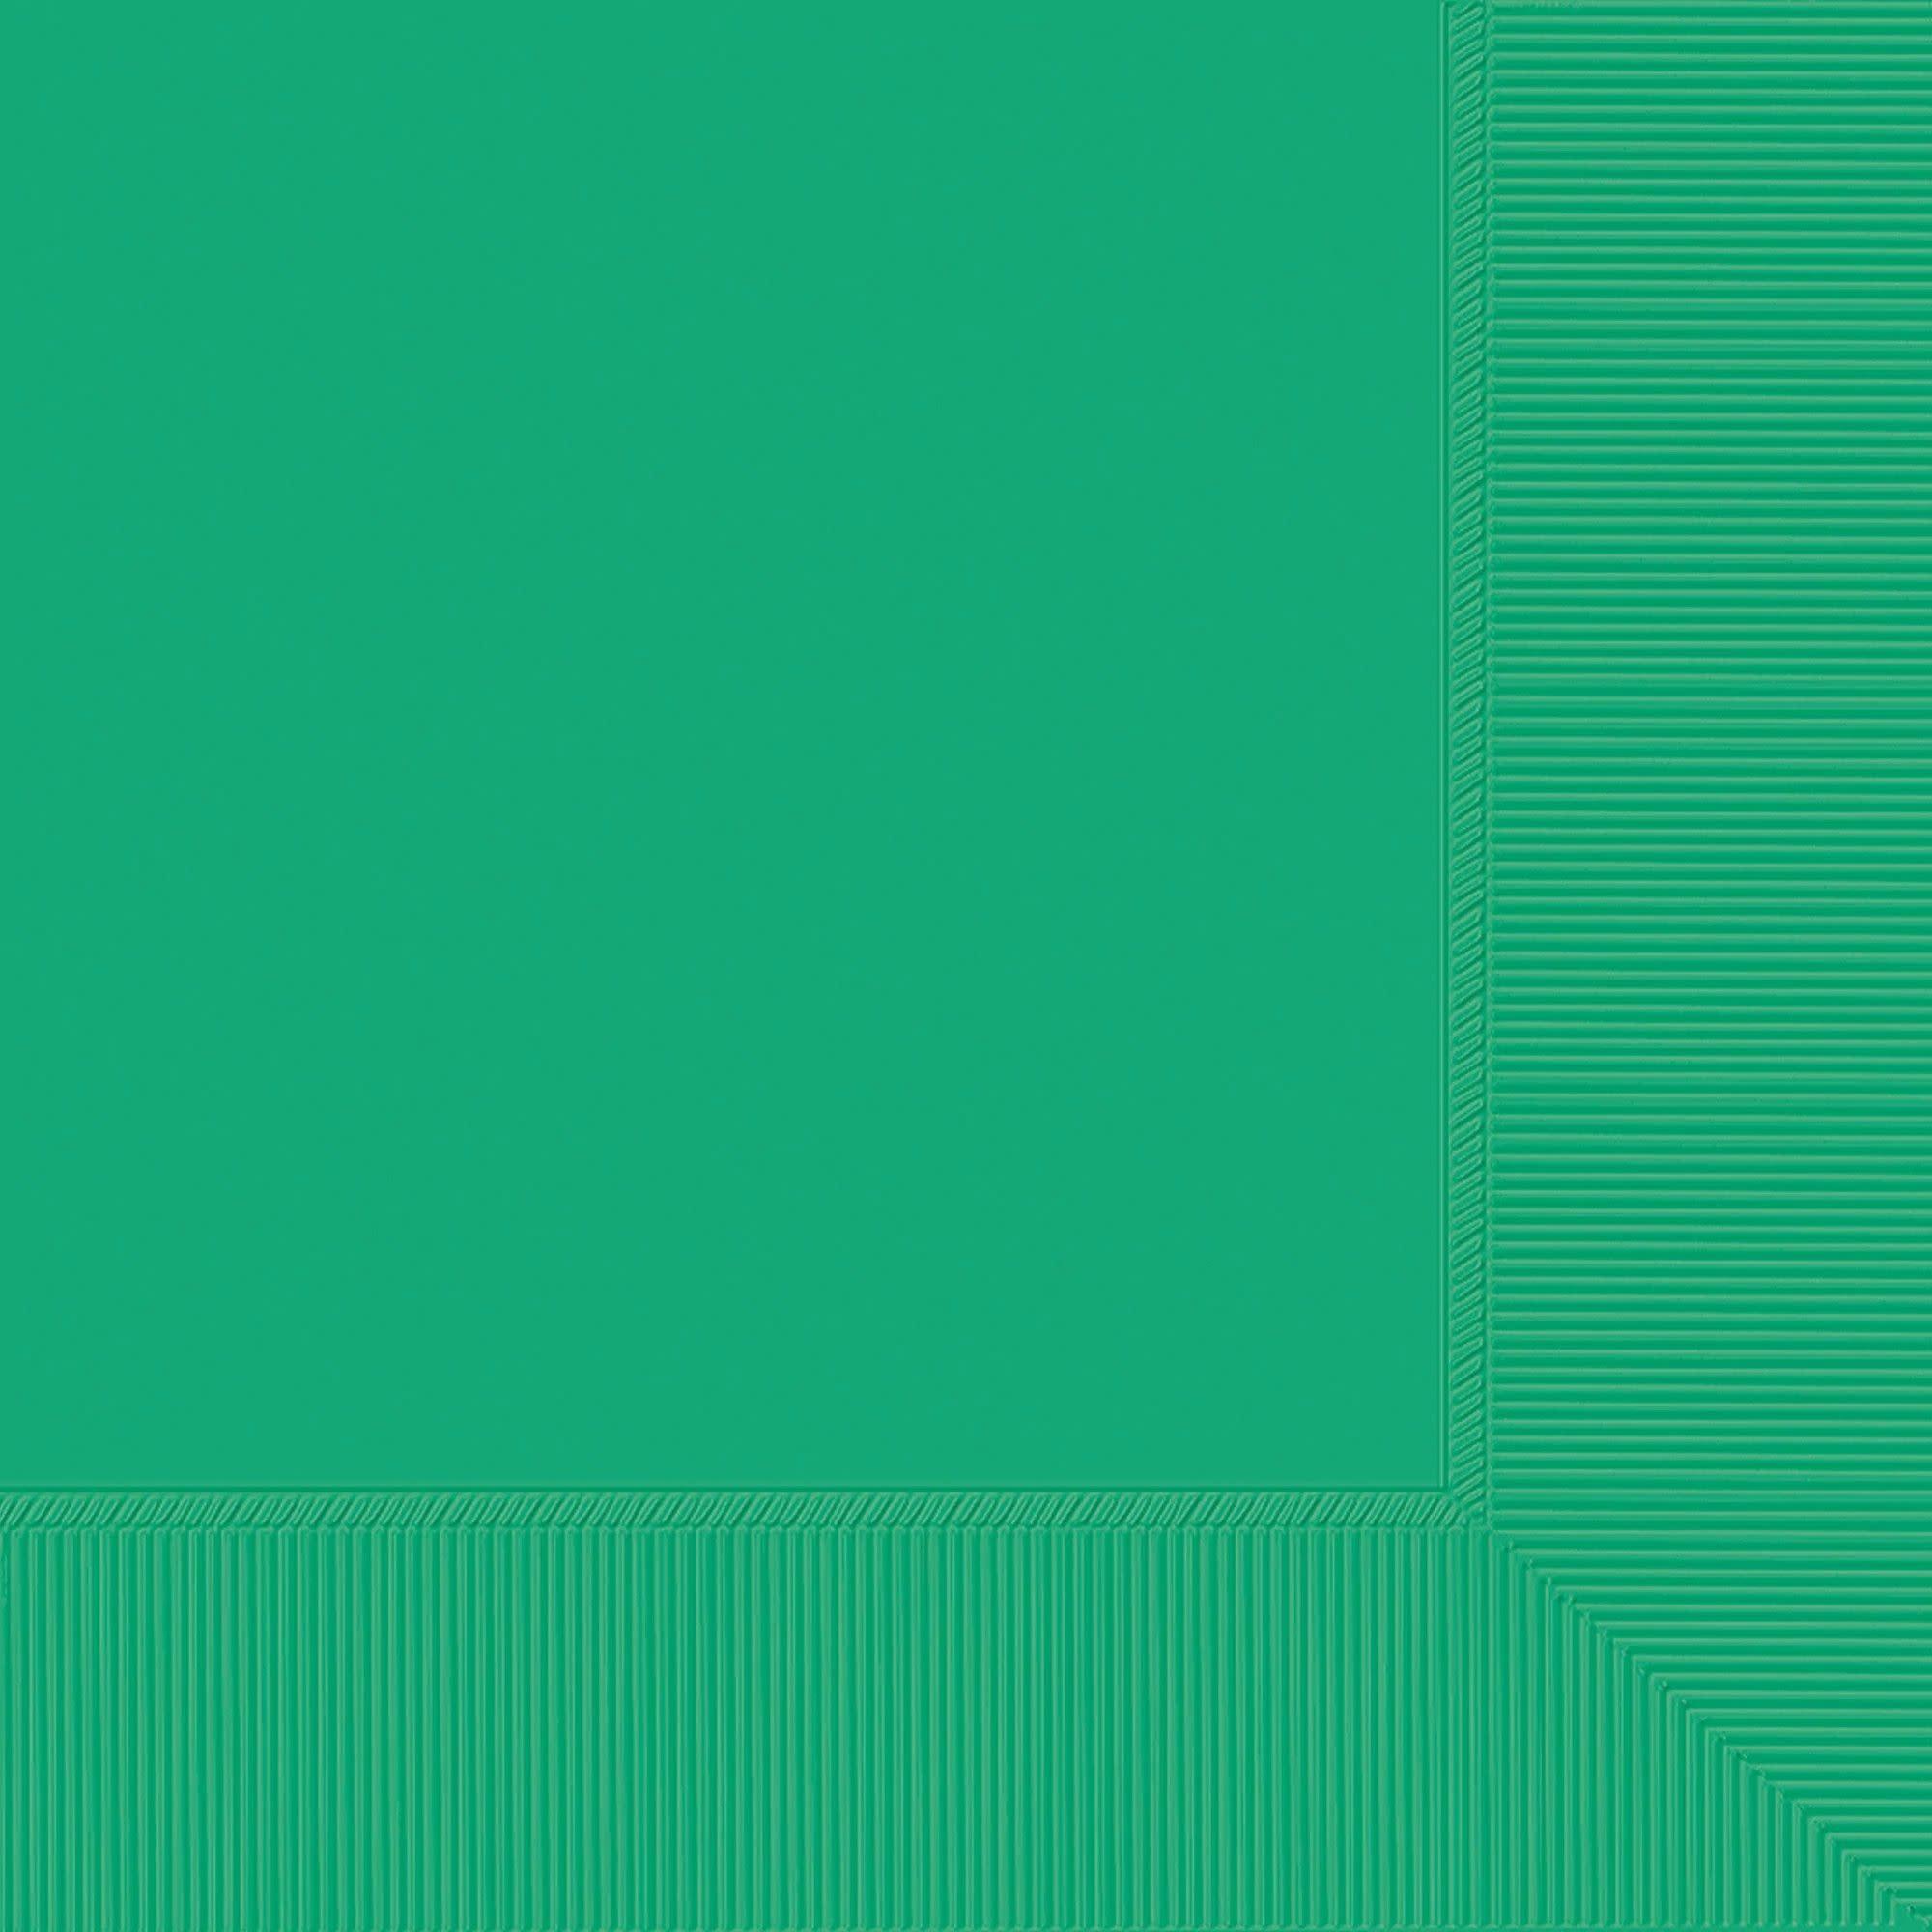 Beverage Napkins, Mid Ct. - Festive Green